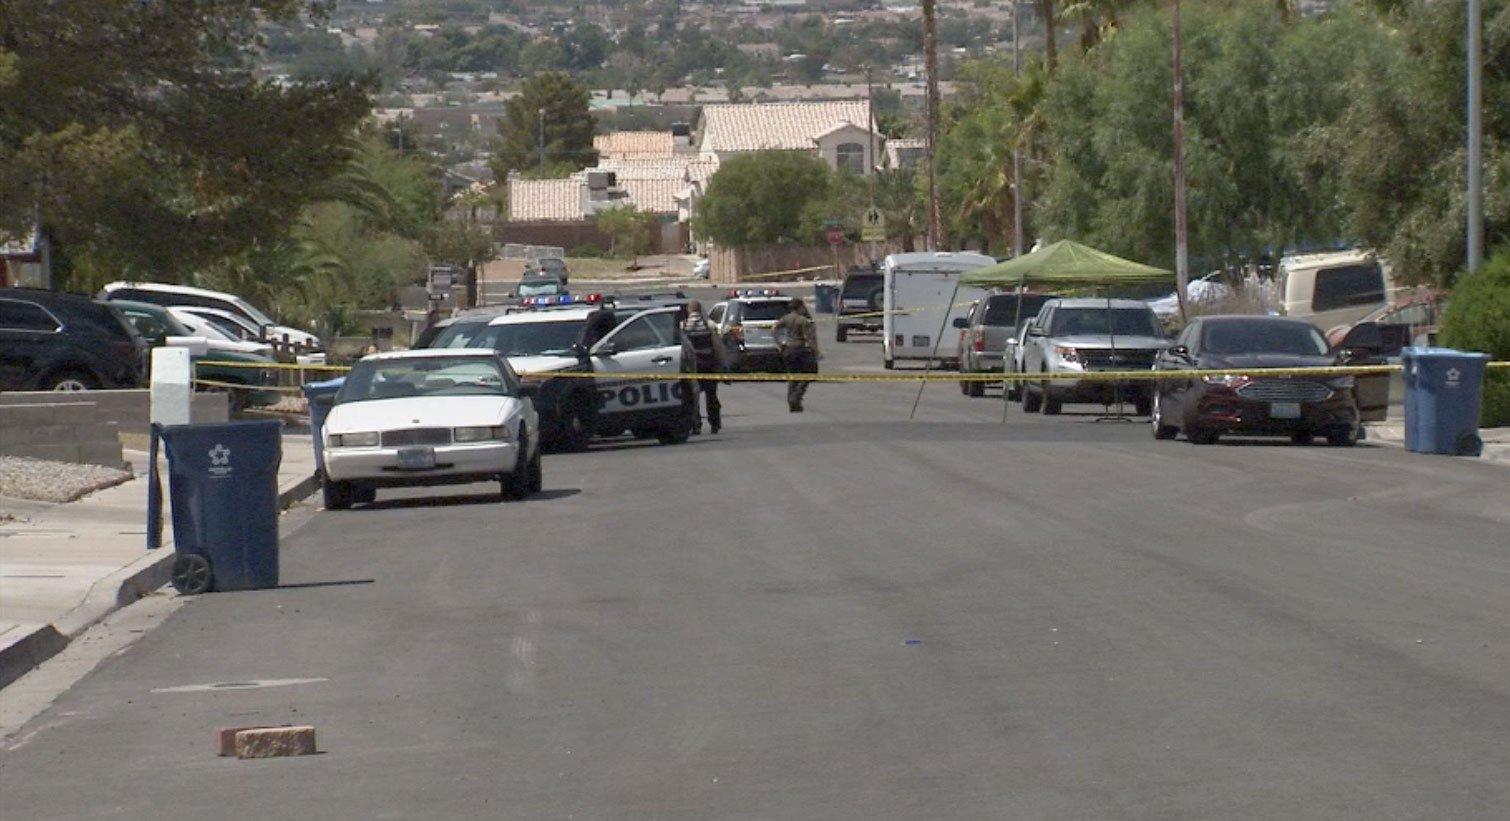 Police investigate a shooting in northeast Las Vegas on Aug. 31, 2017. (Armando Navarro/FOX5)